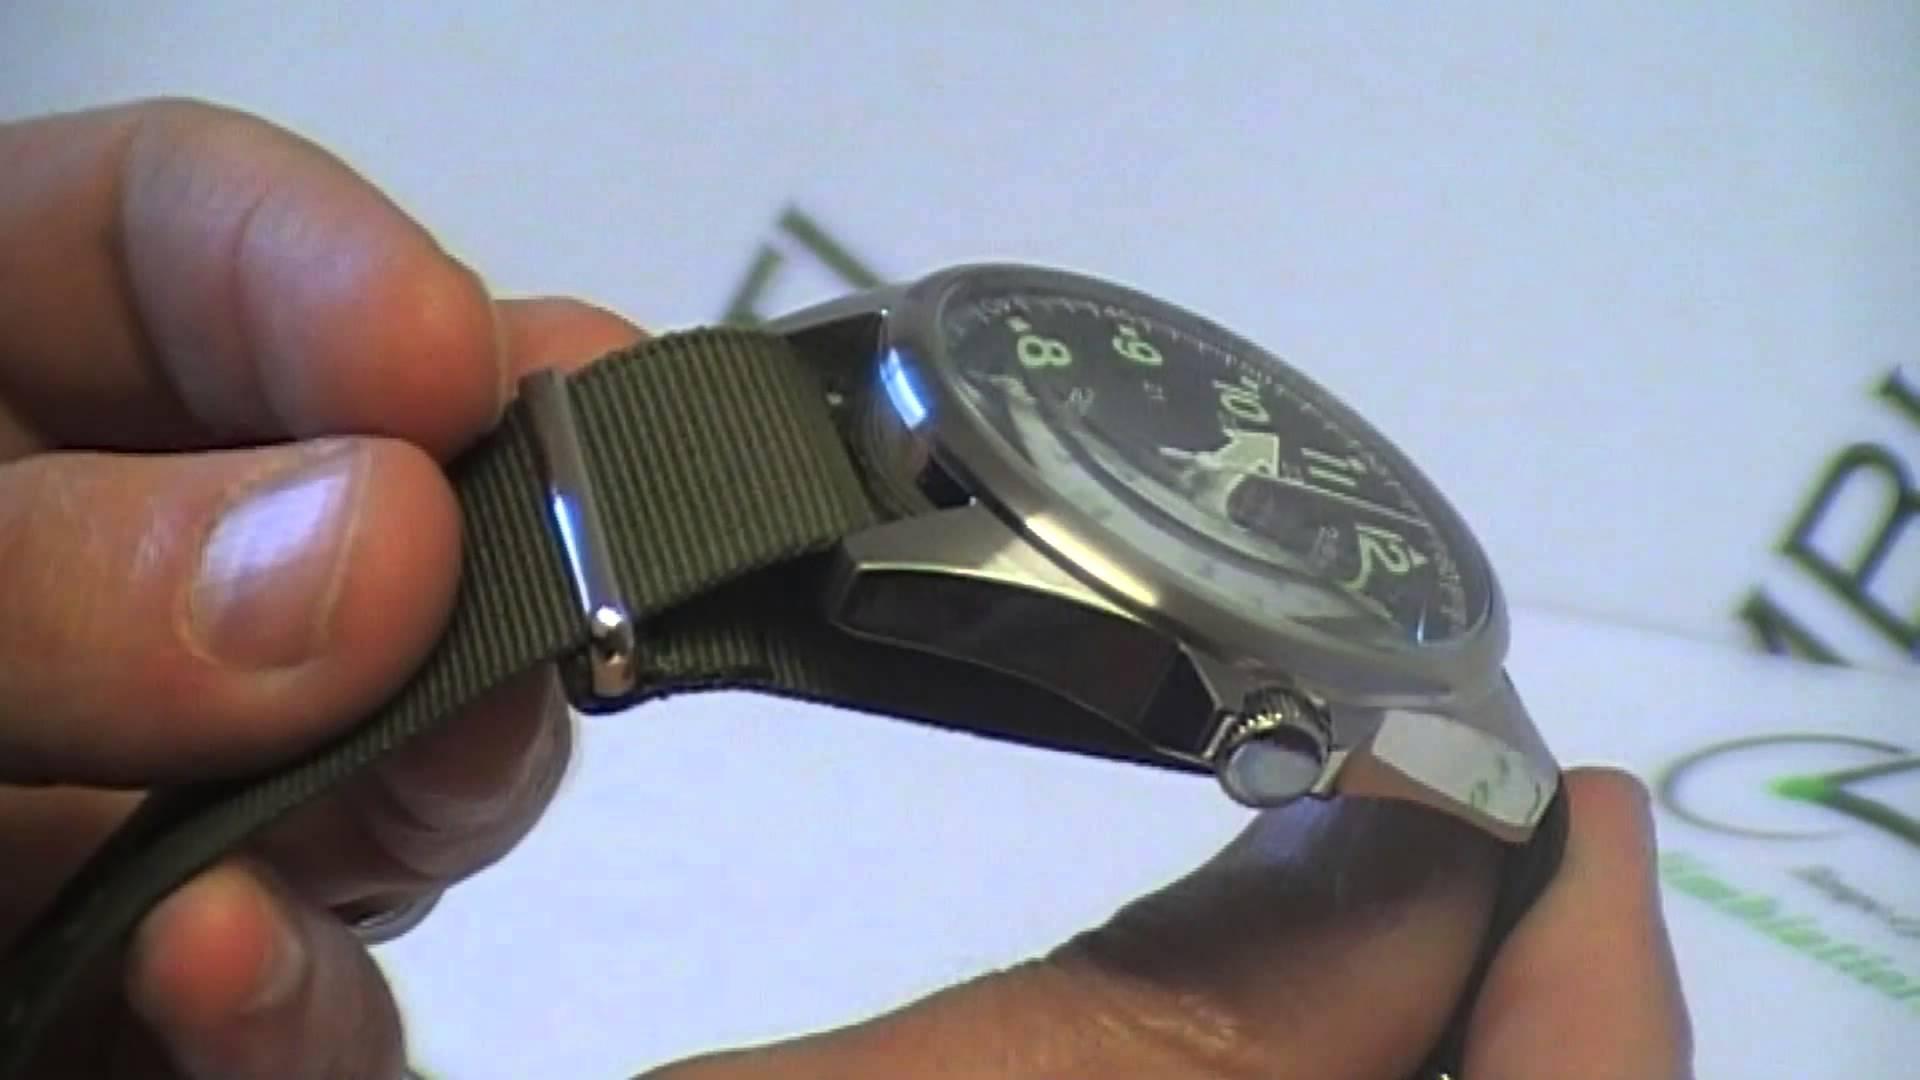 I migliori orologi militari